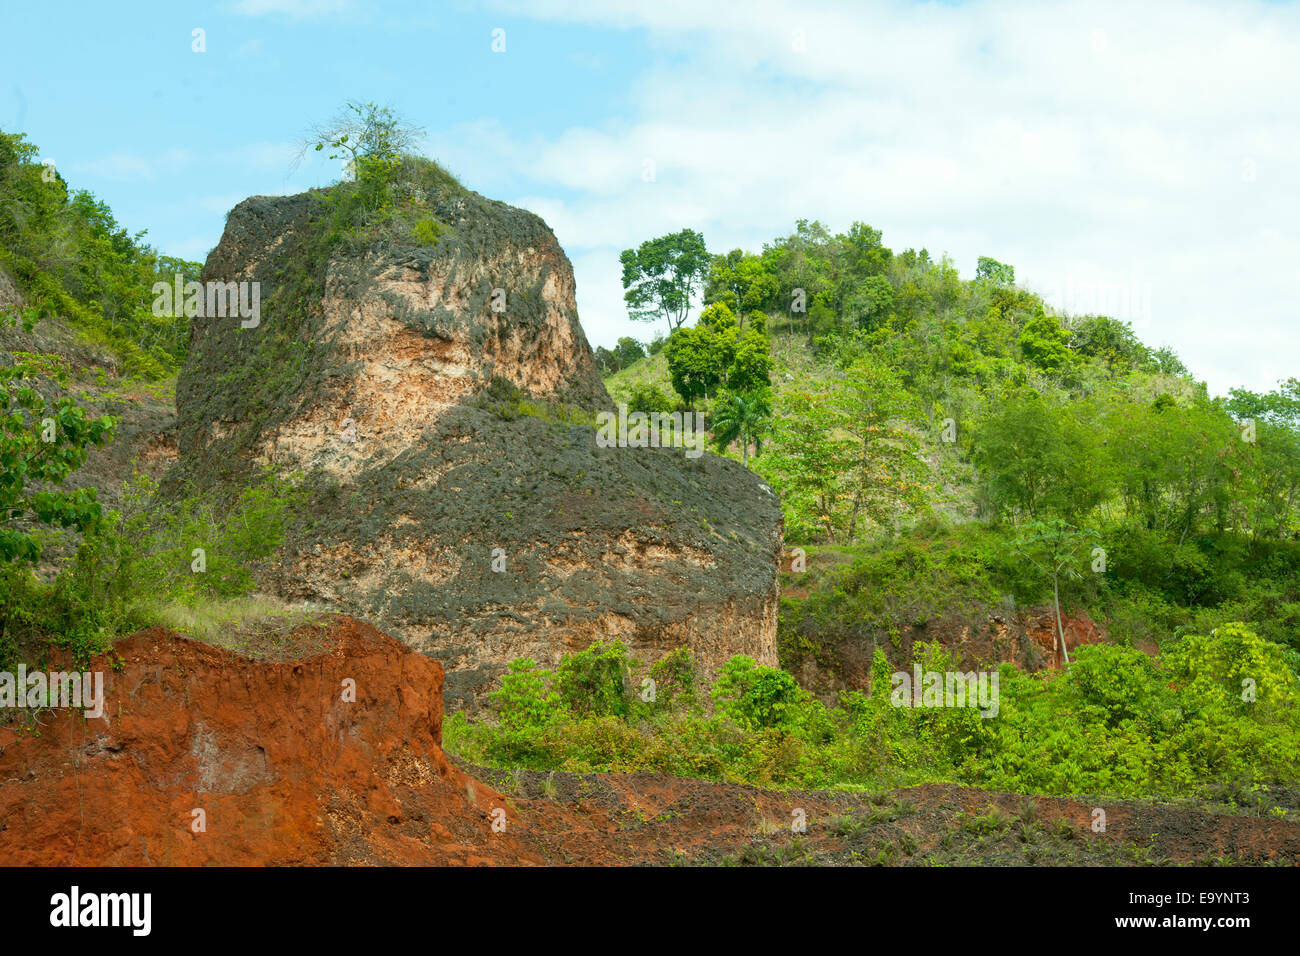 Dominikanische Republik, Osten, Autopista del Nordeste von nagua / Santo Domingo durch den Nationalpark Los Haitises, Stockbild